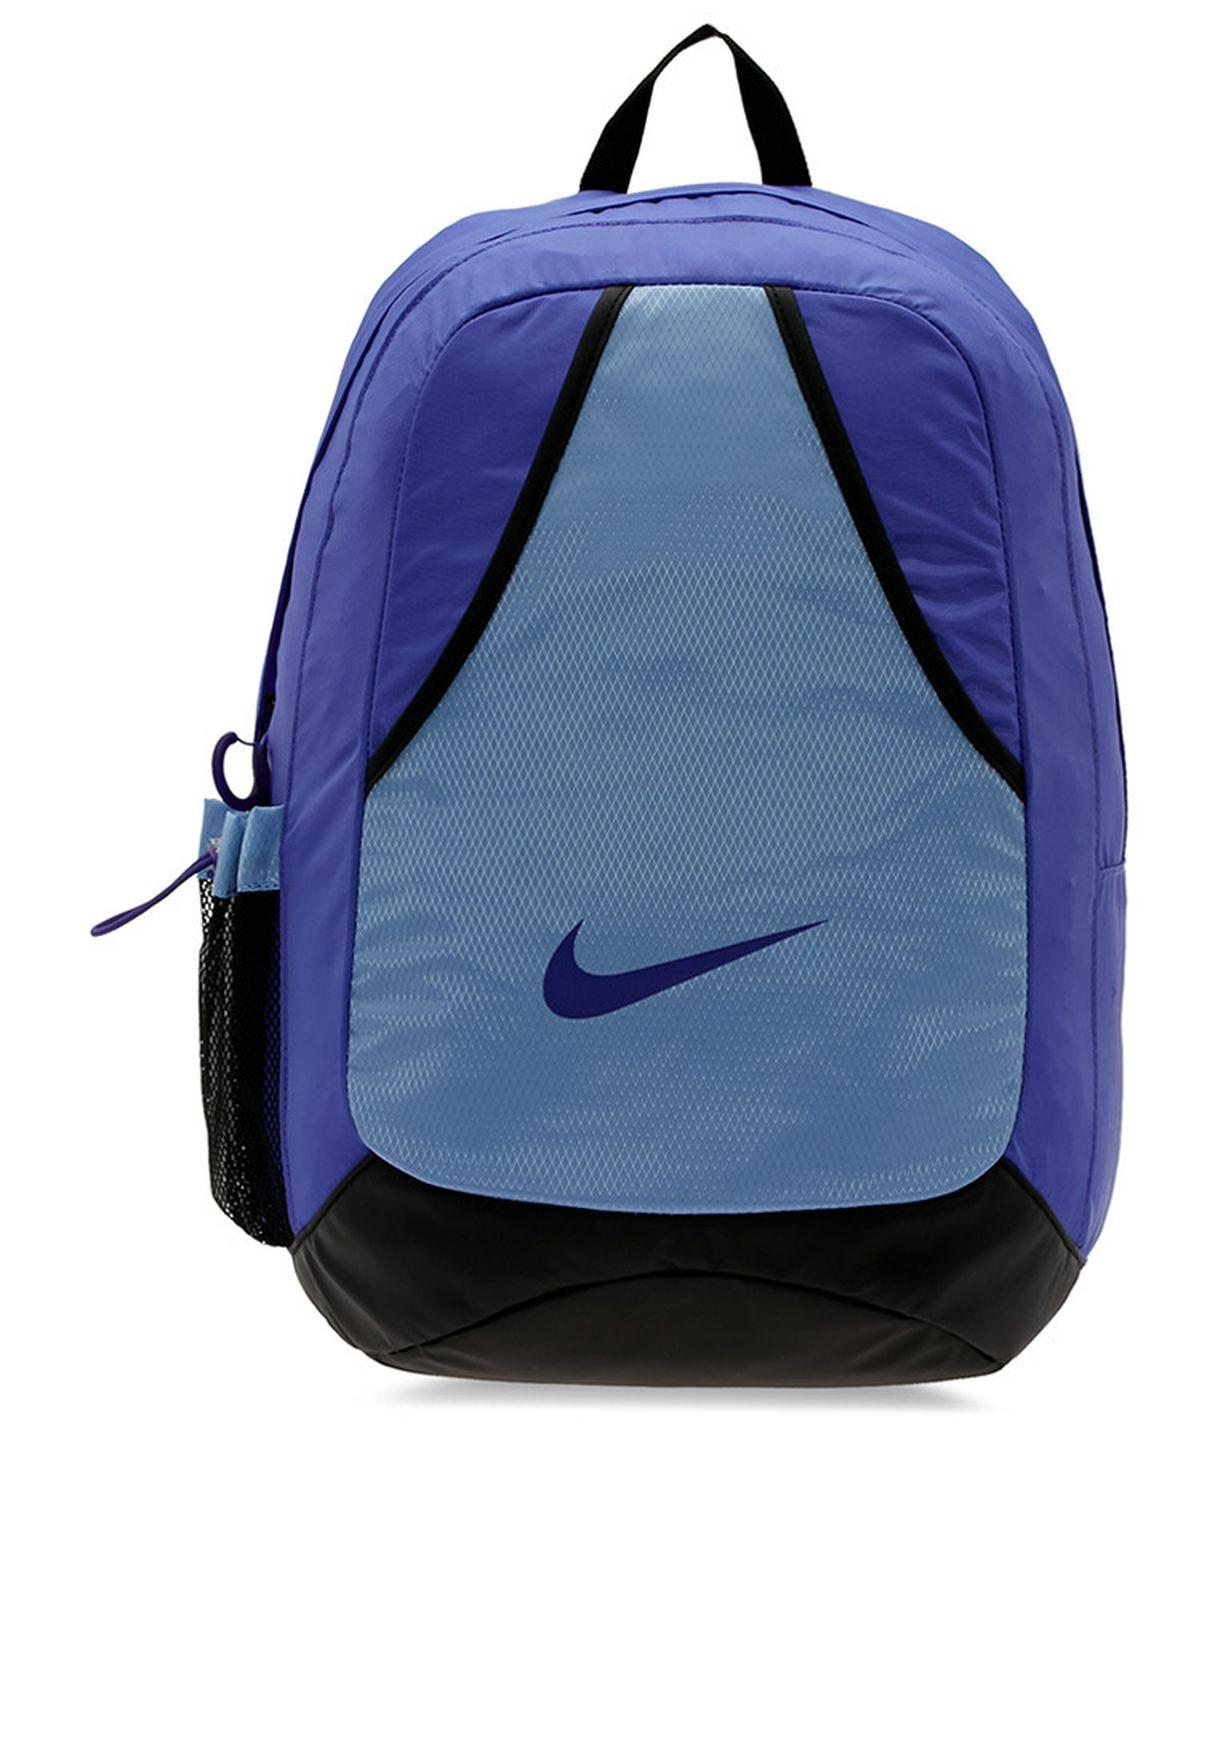 d9bf1337a37 Shop Nike blue Varsity Backpack NEQP-BA3351-564 for Women in Oman -  NI727AC72IHJ